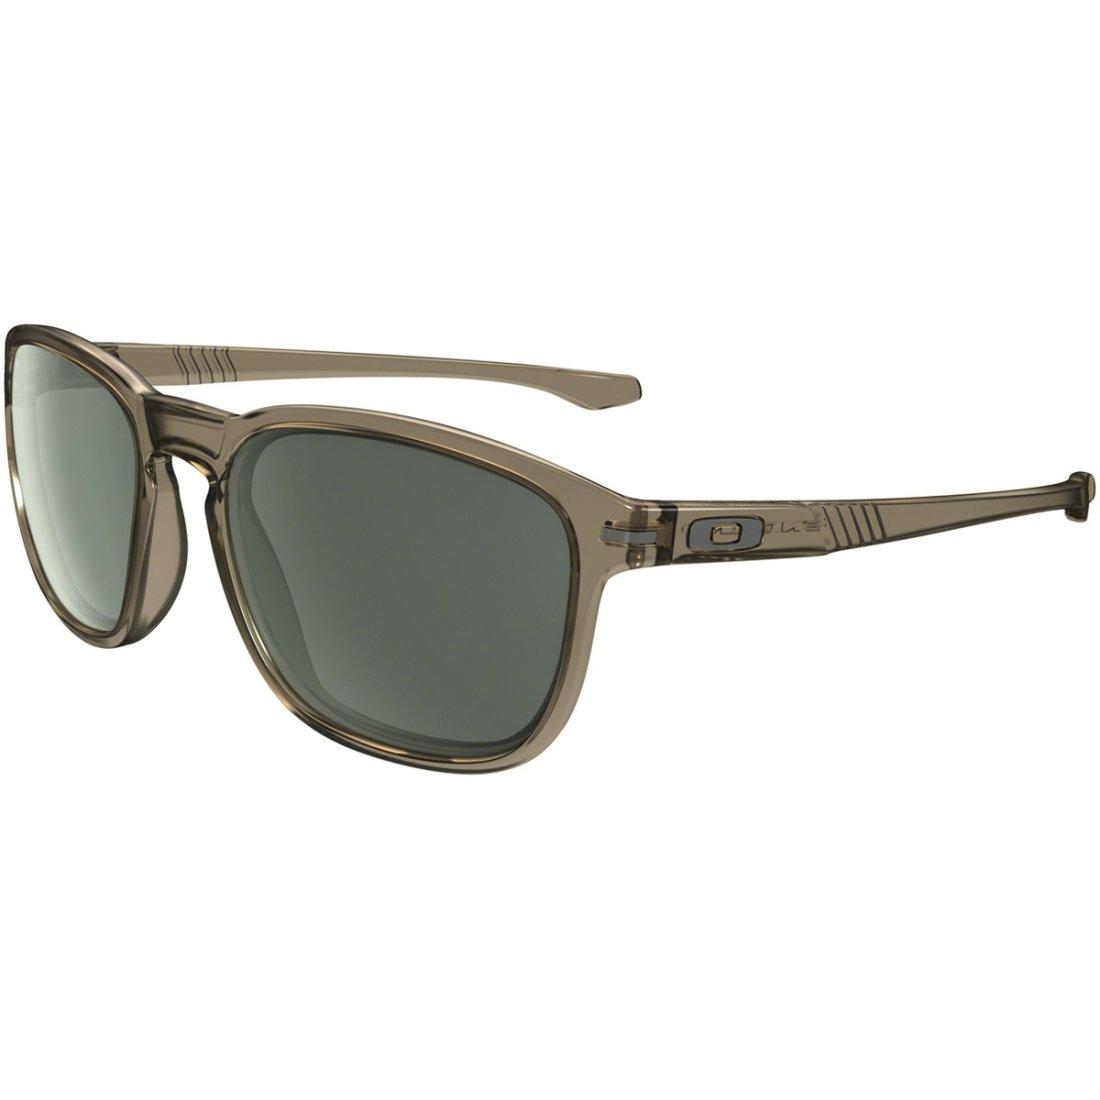 289bace9d2 OAKLEY Enduro Ink Collection Sepia   Dark Grey Sun glasses · Motocard